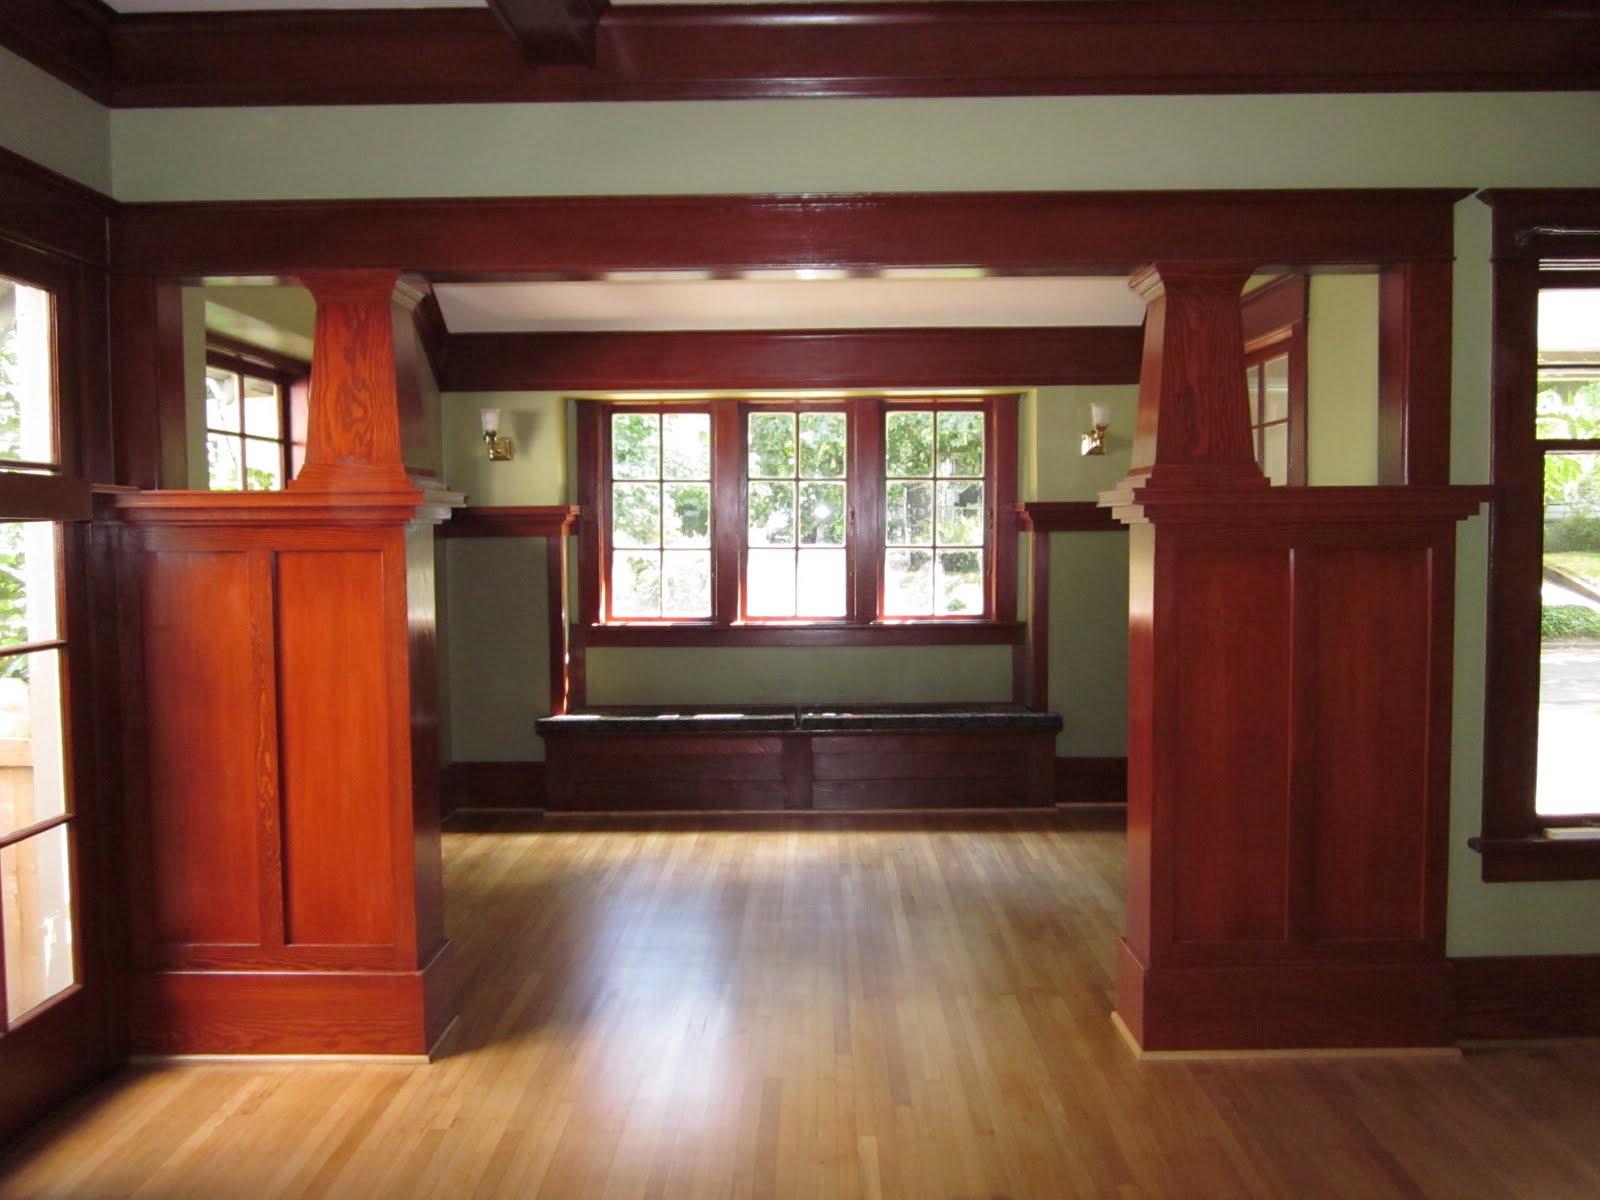 Chicago Bungalow Floor Plans Laurelhurst Craftsman Bungalow Living Room Photos